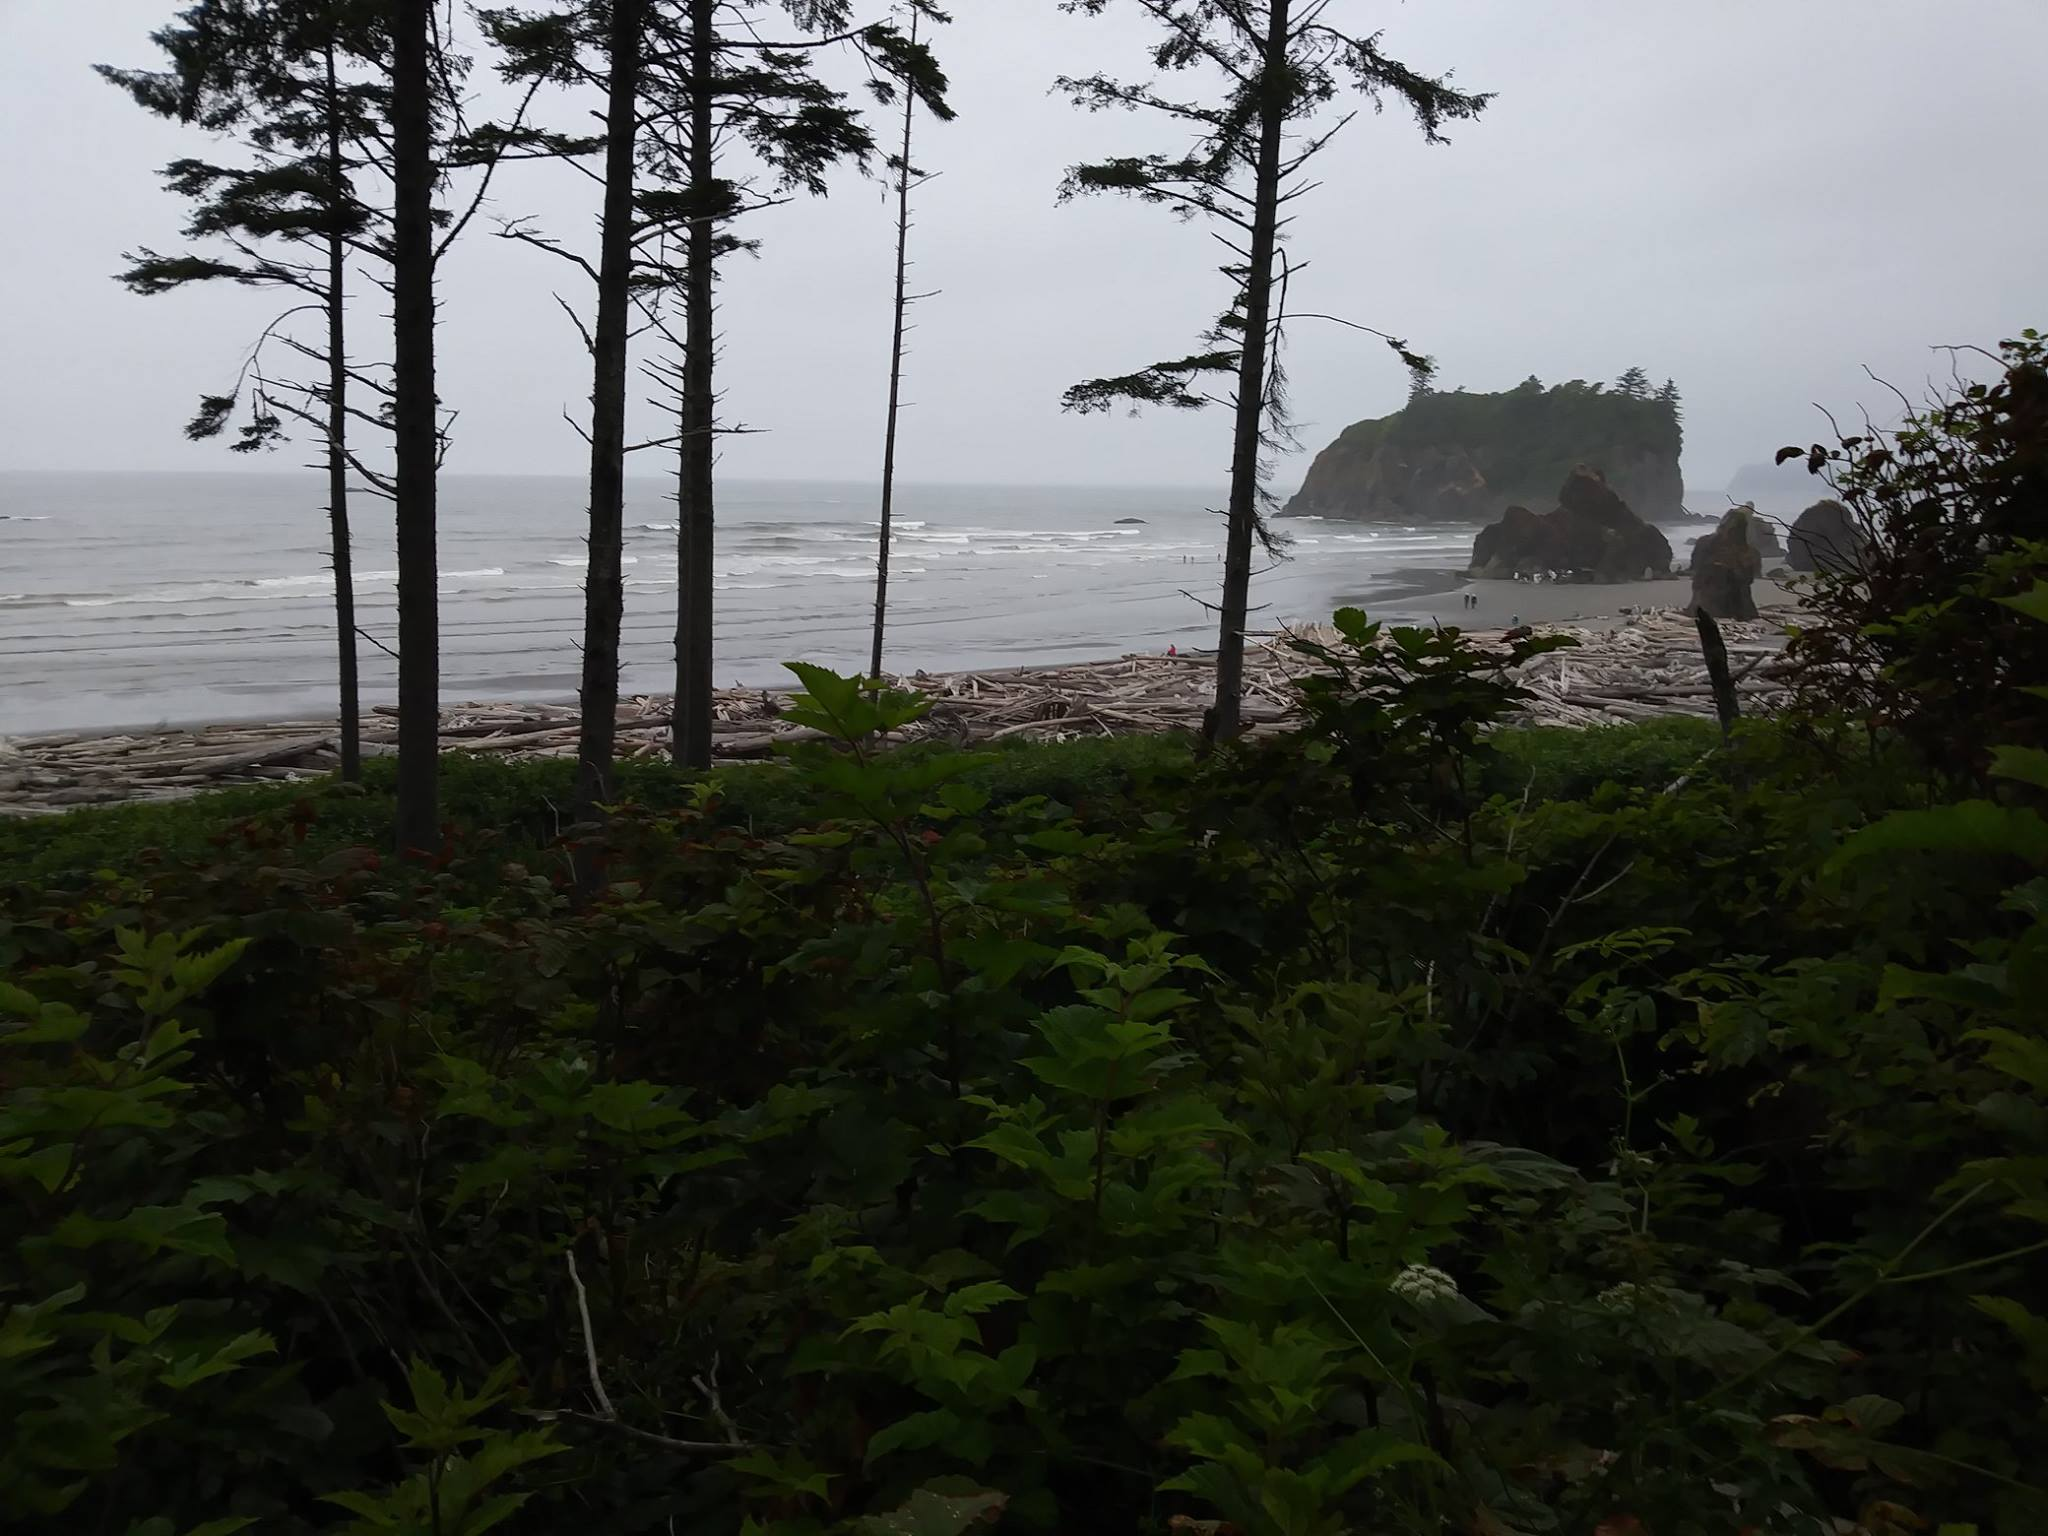 Beach Day, 2017